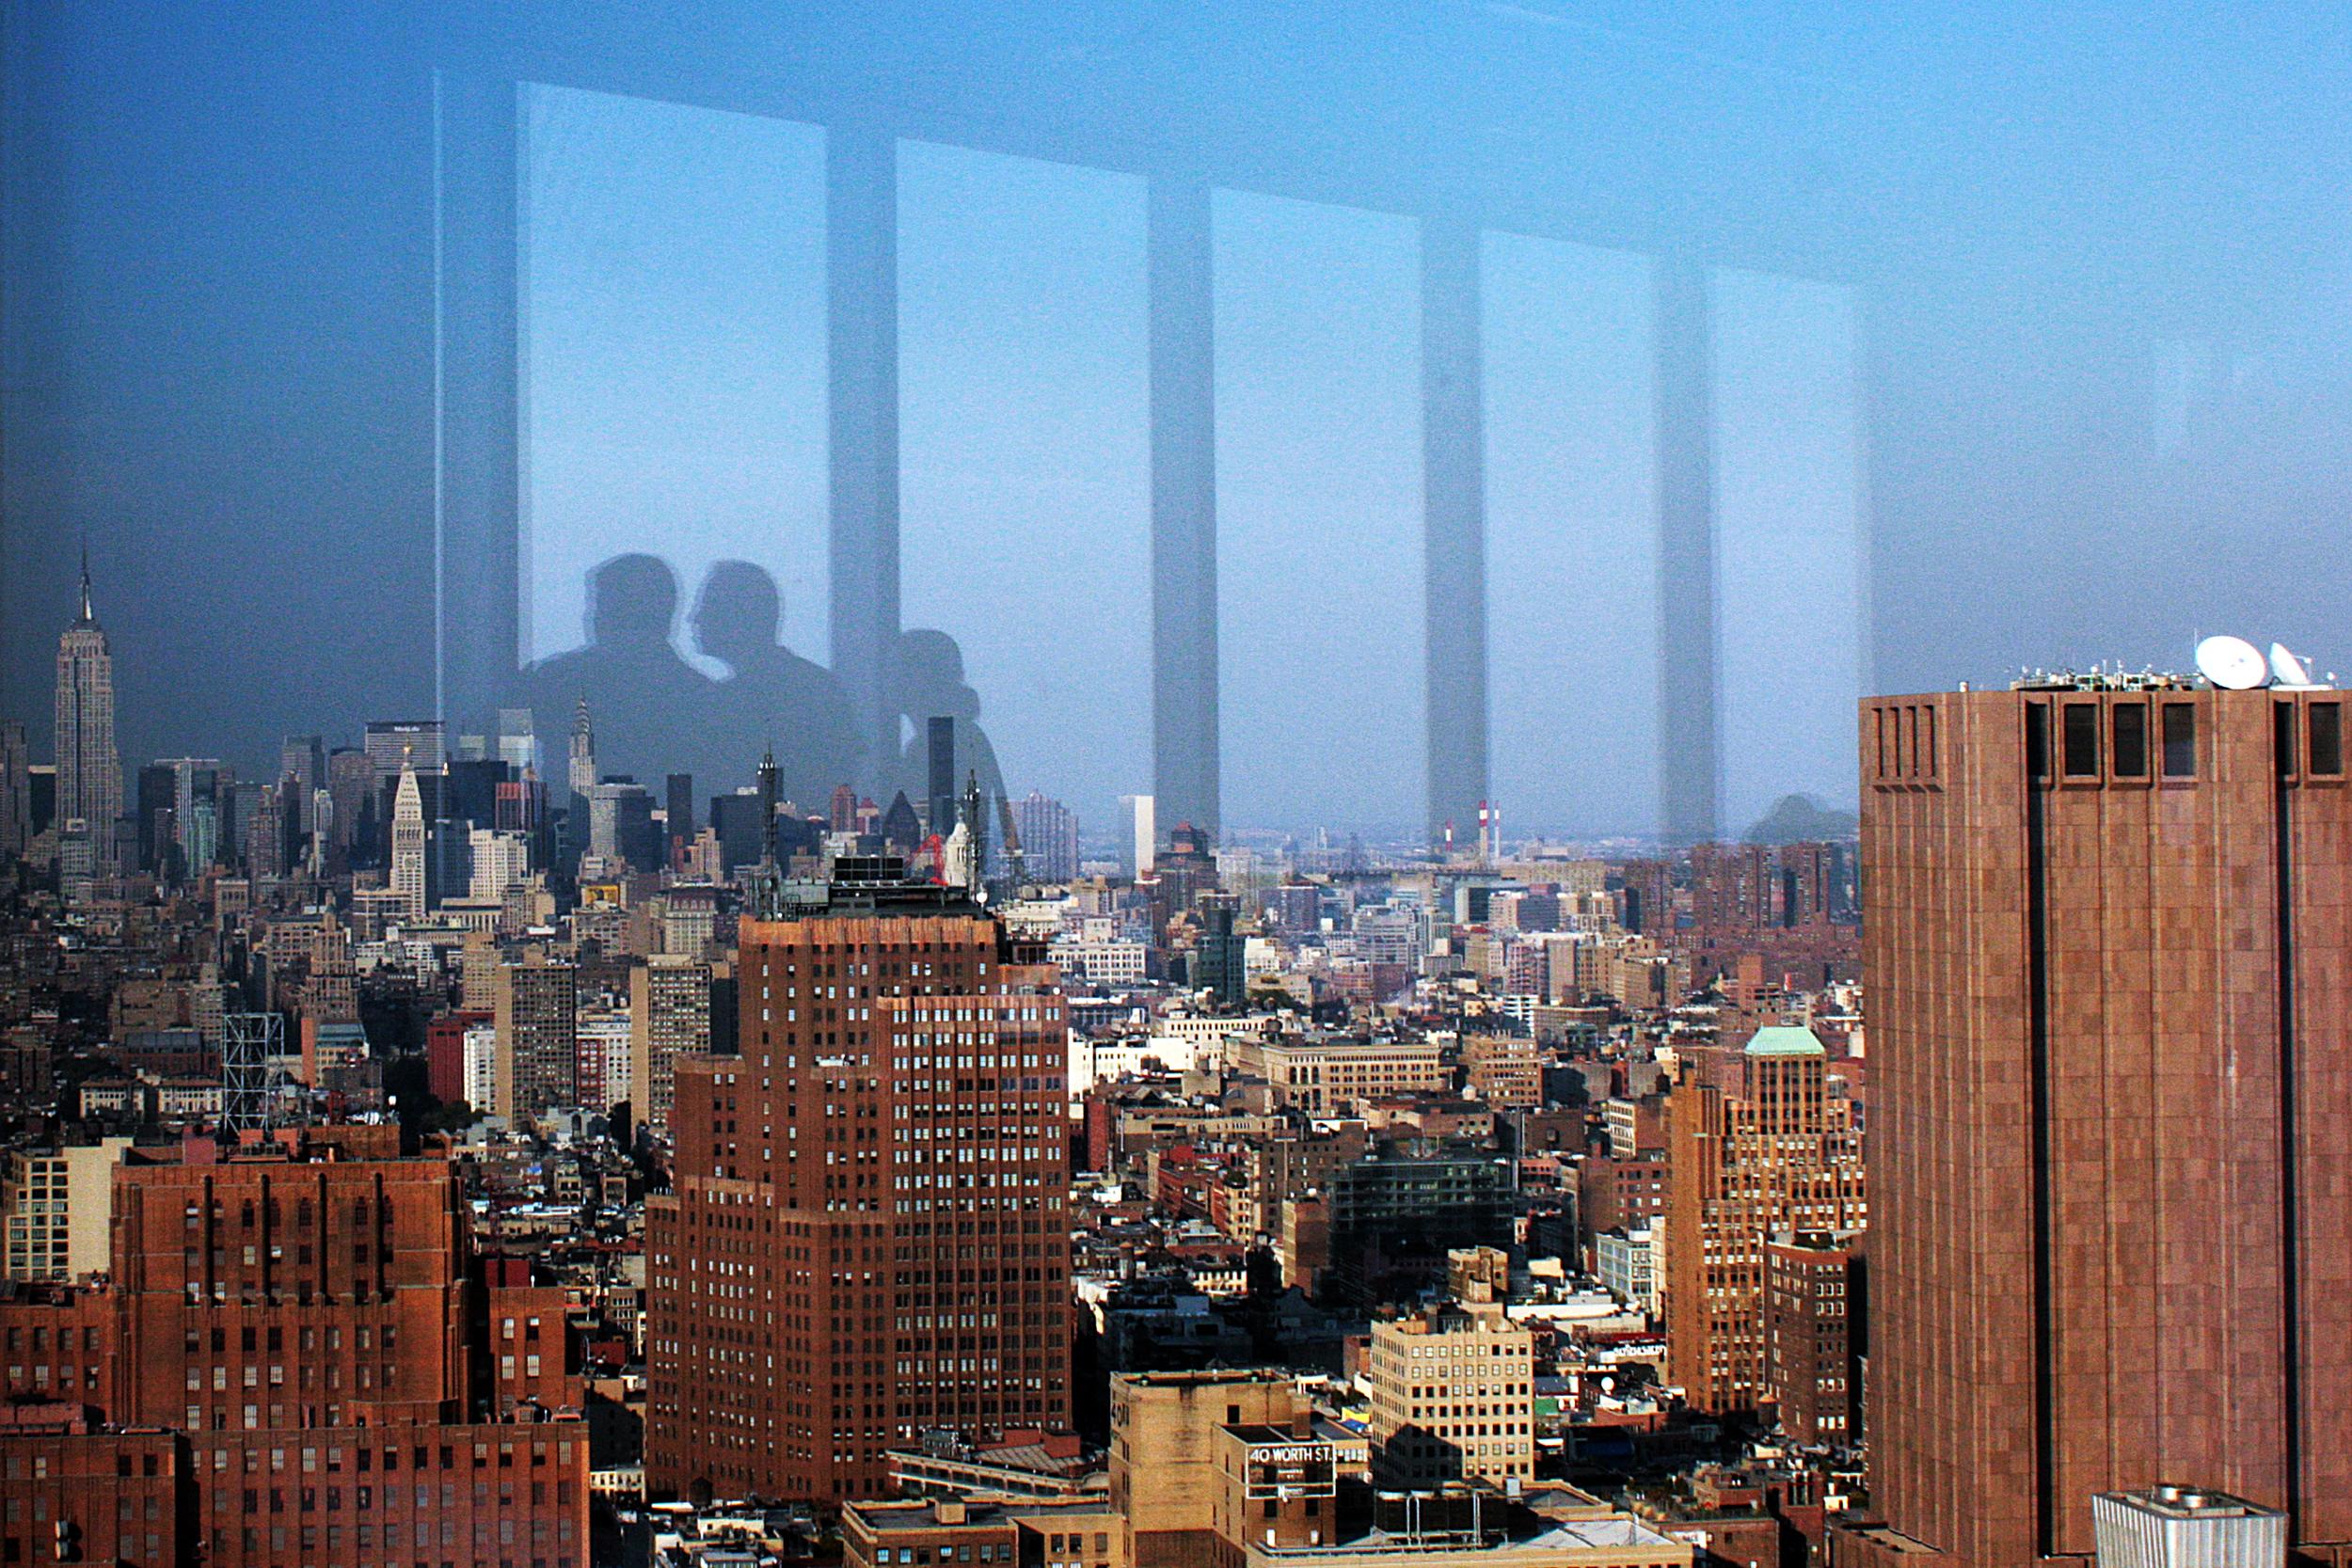 new-york-academy-of-sciences_1510395541_o.jpg